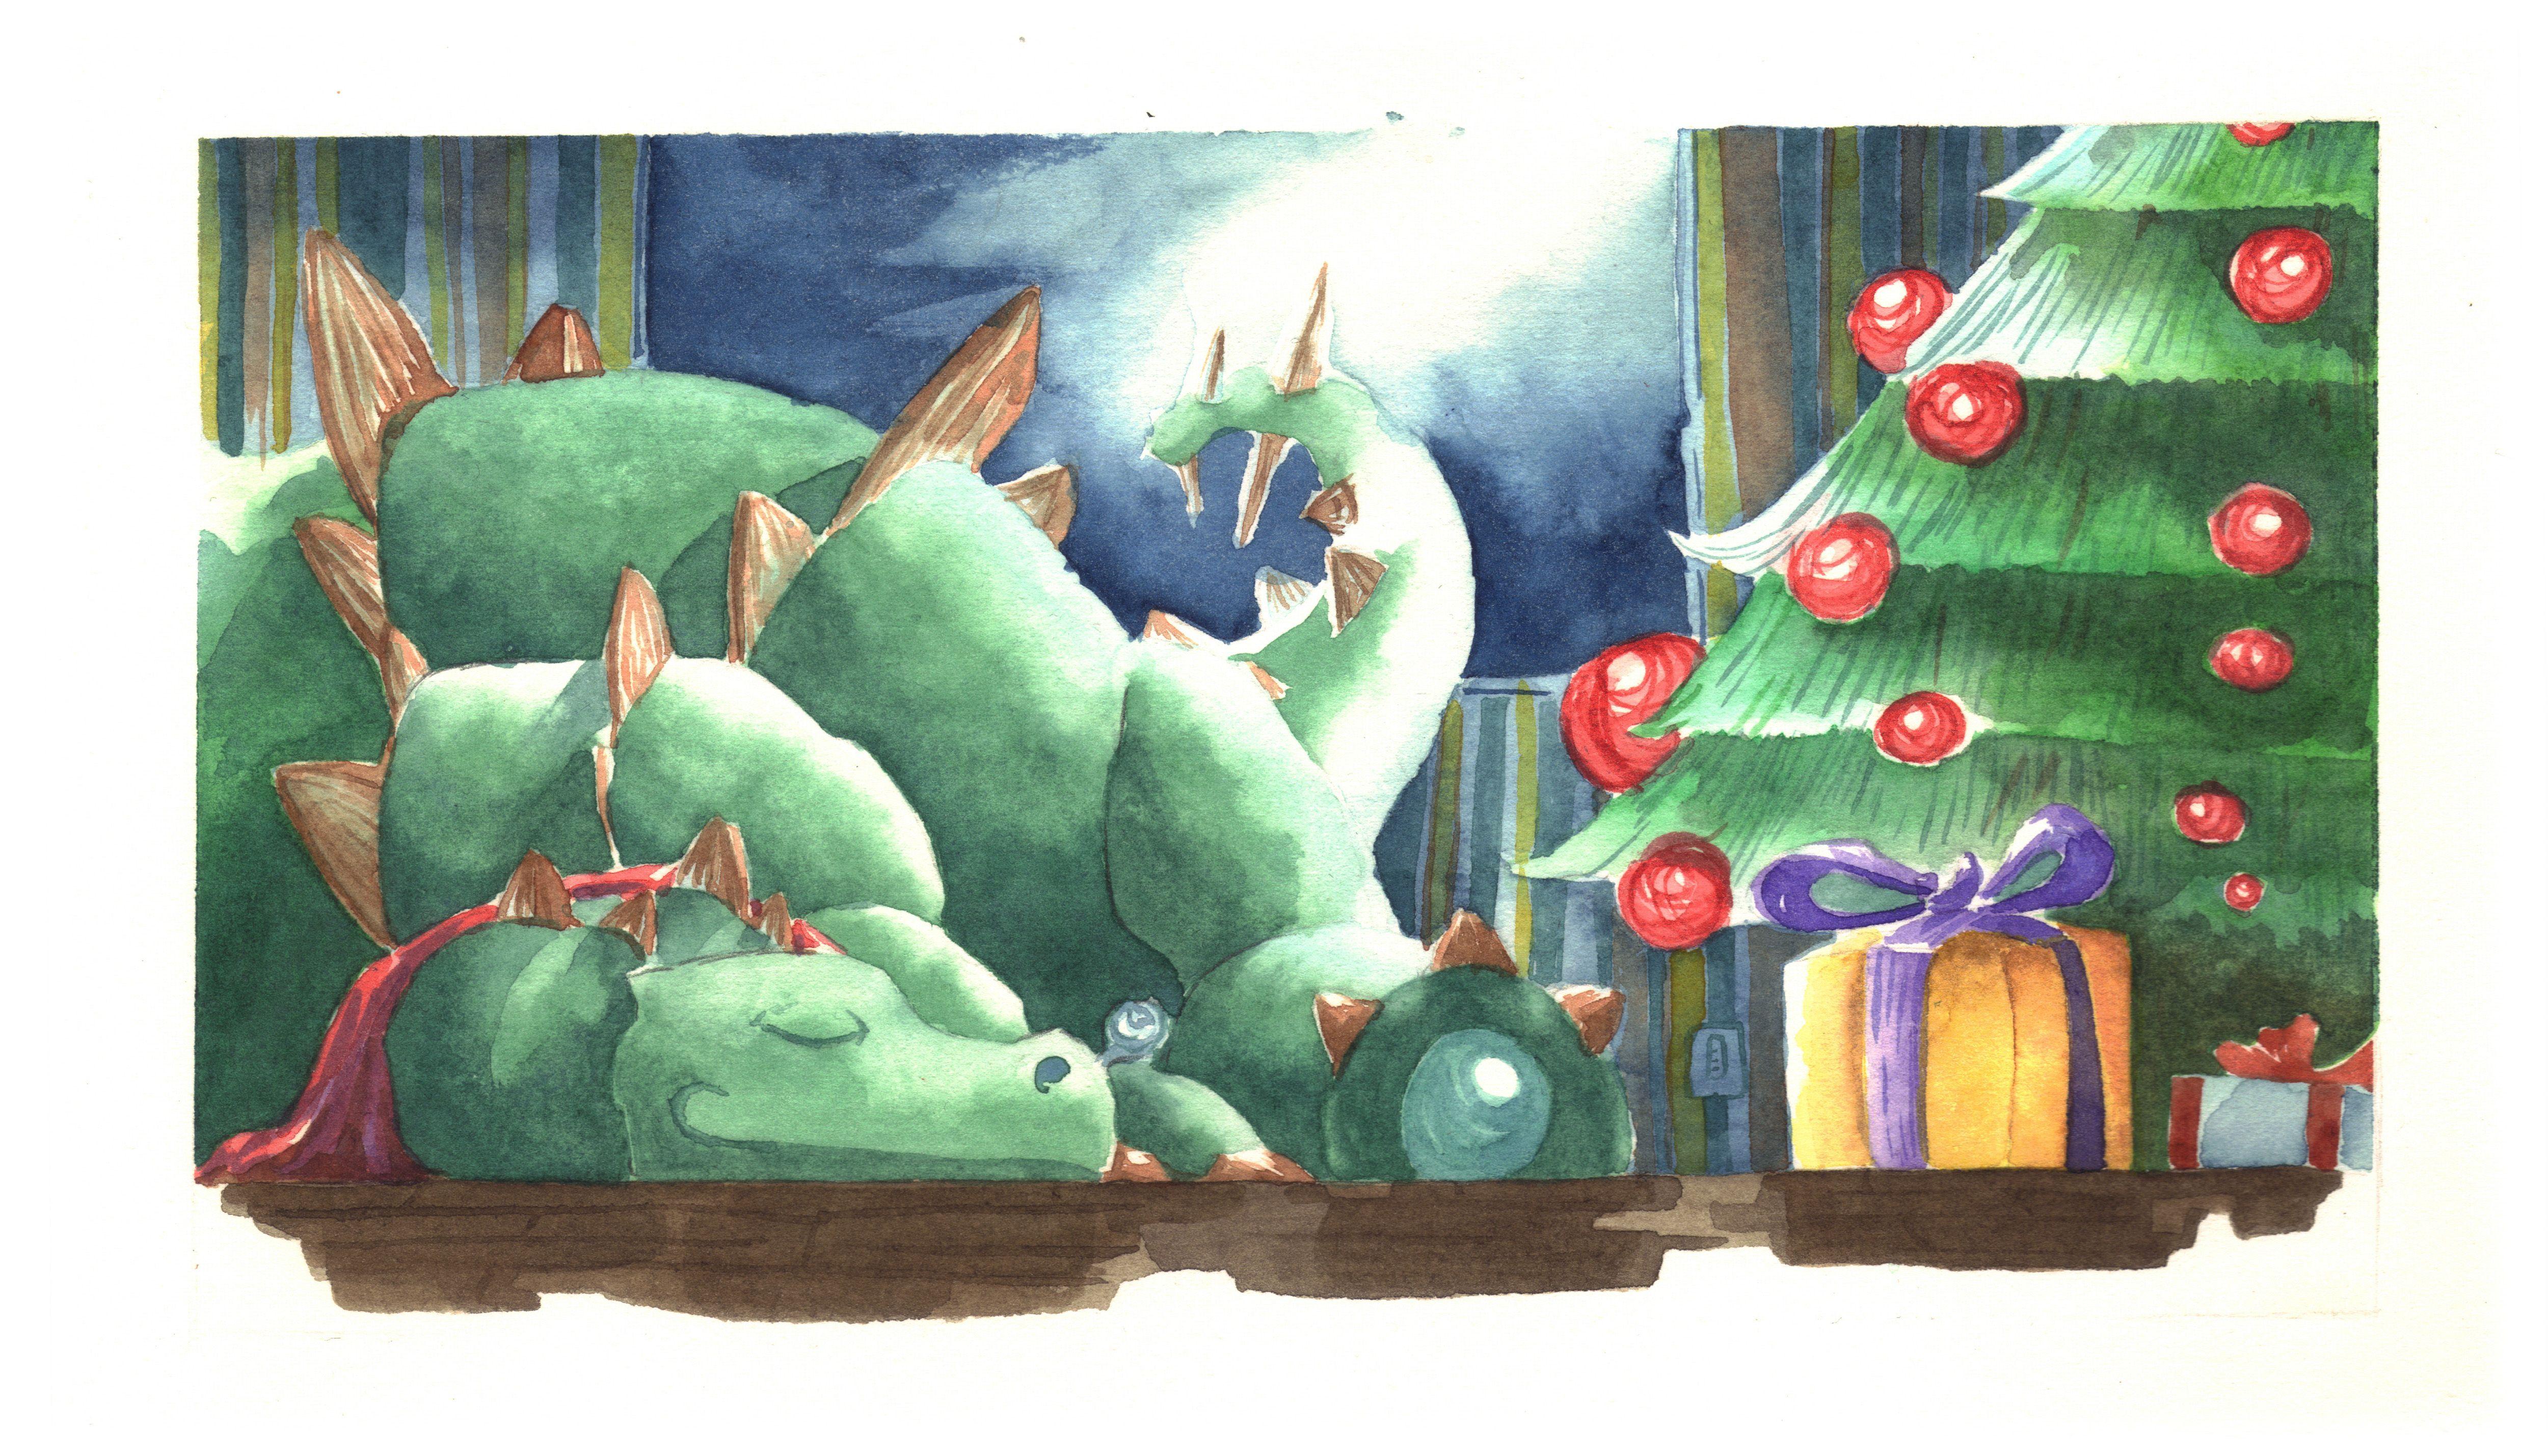 Dinosauri natalizi by Andrea Iusso